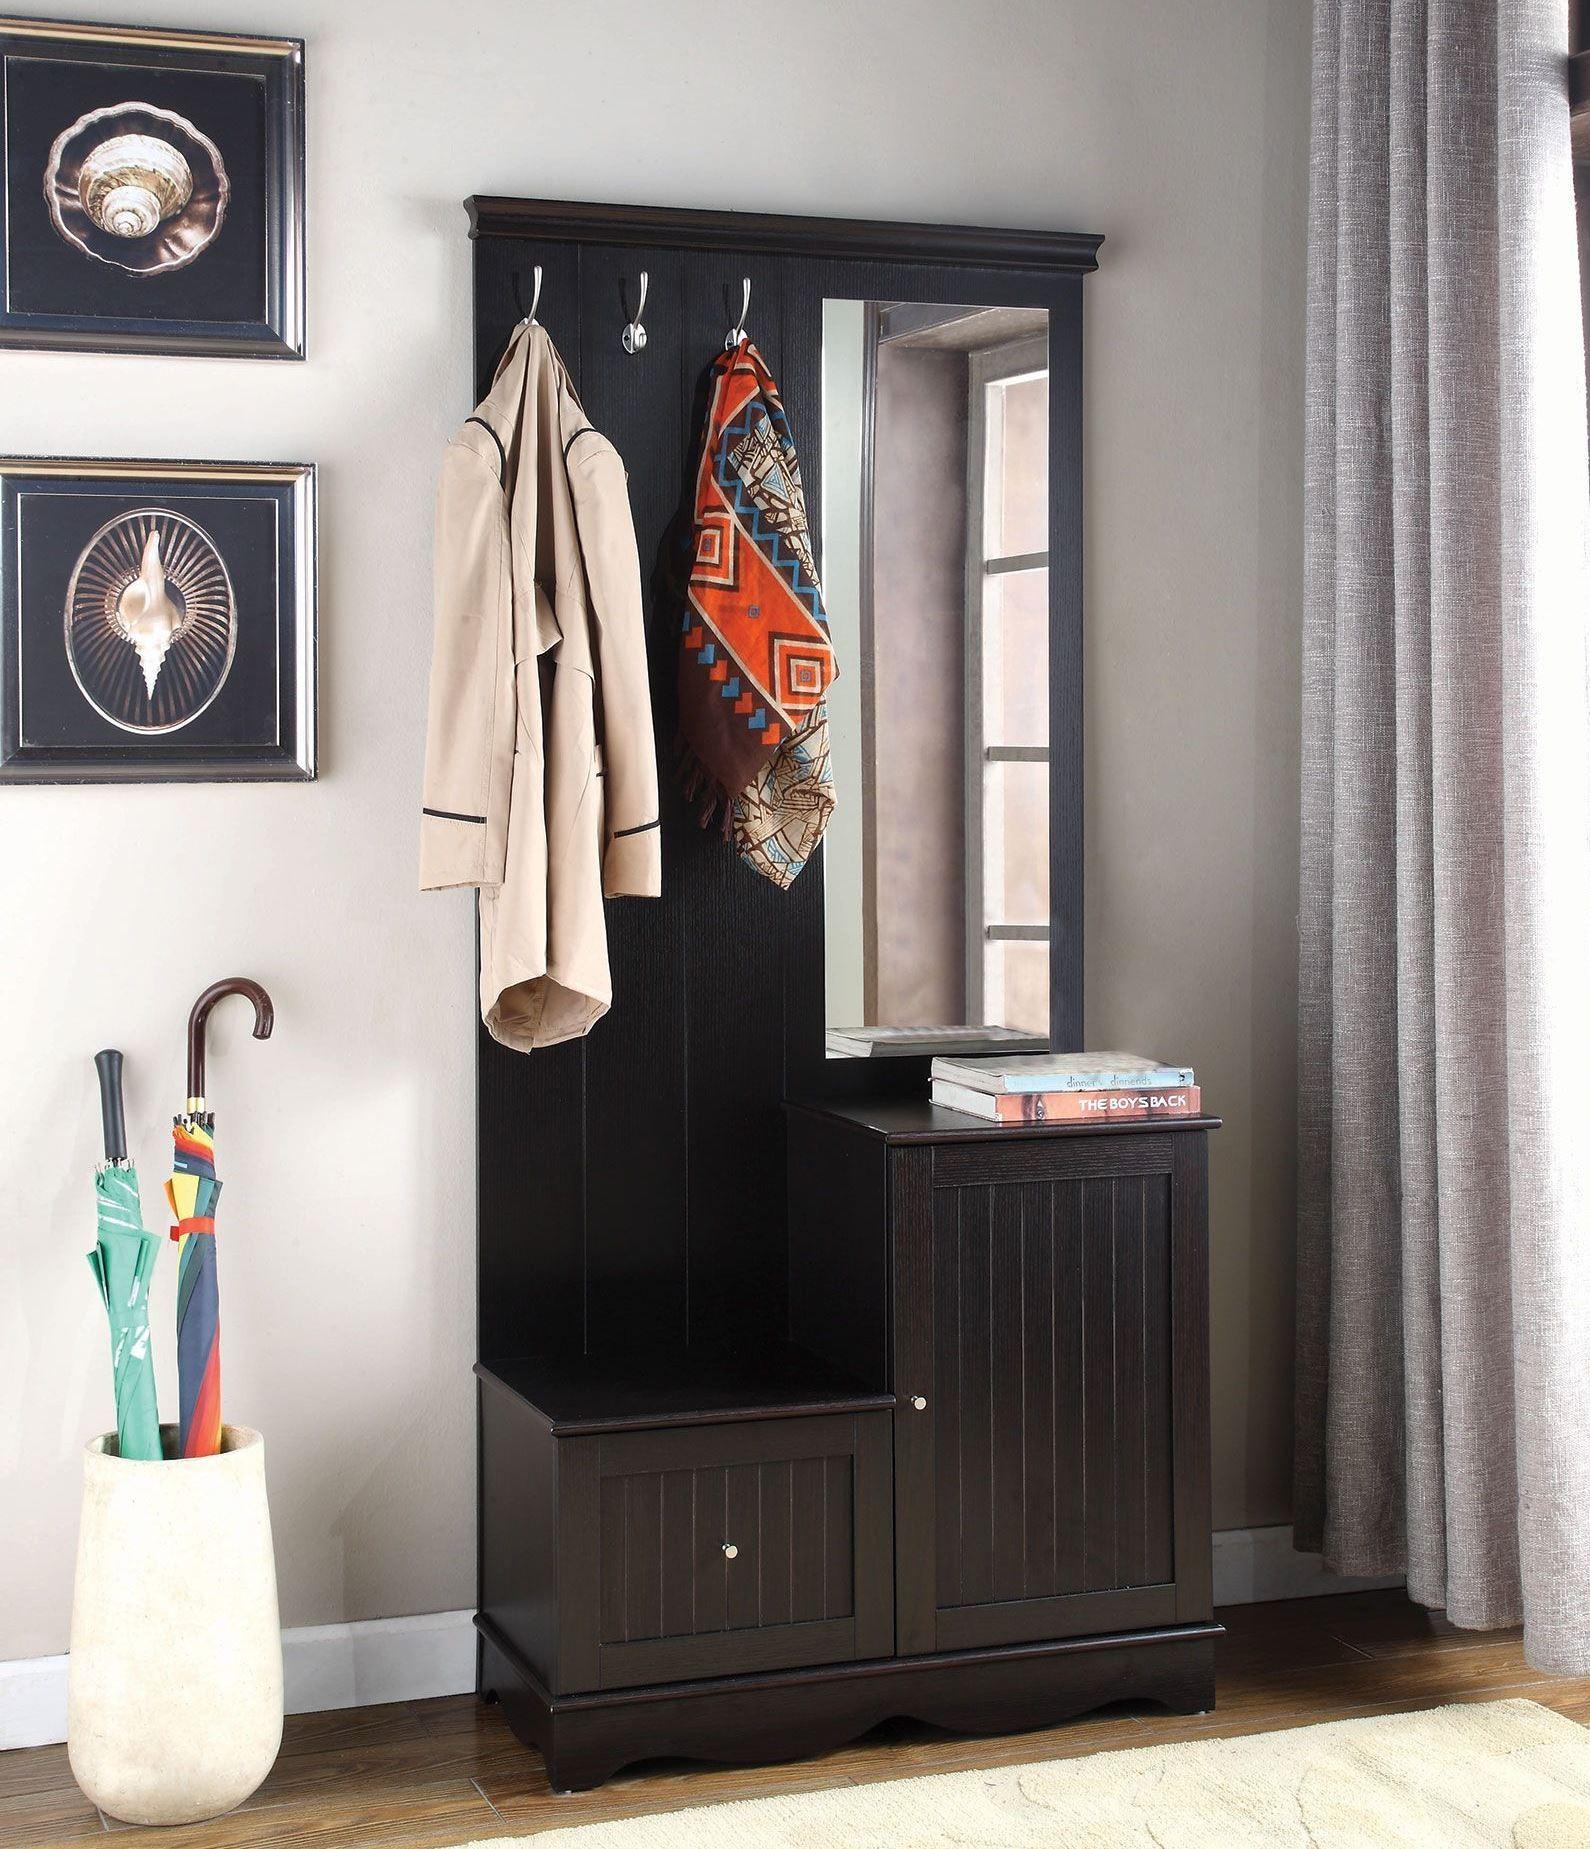 All American Mattress And Furniture Nc: Alternative Accents & Decor